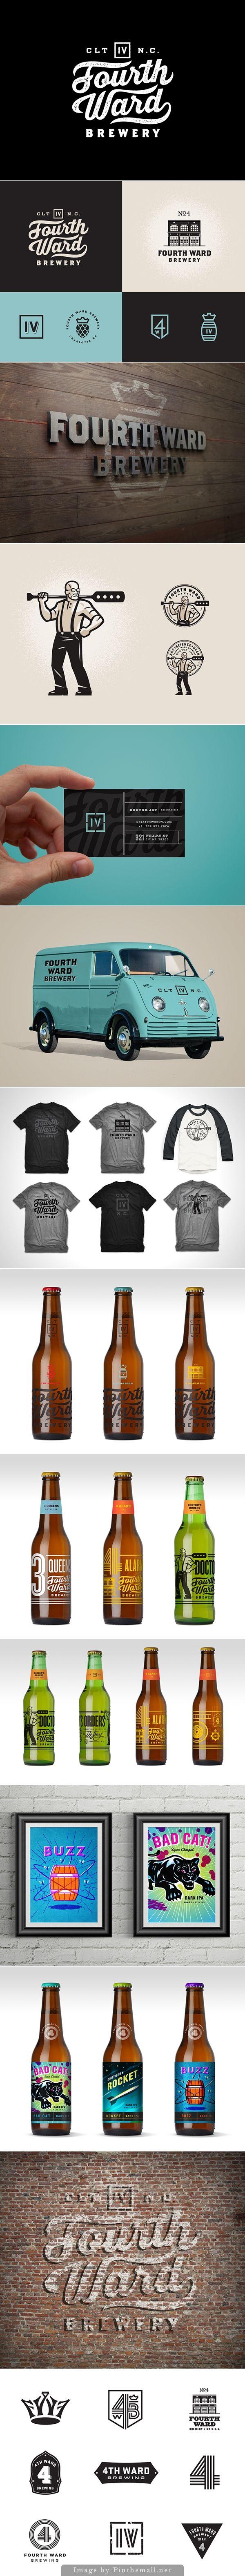 Fourth Ward Brewery By Matt Stevens